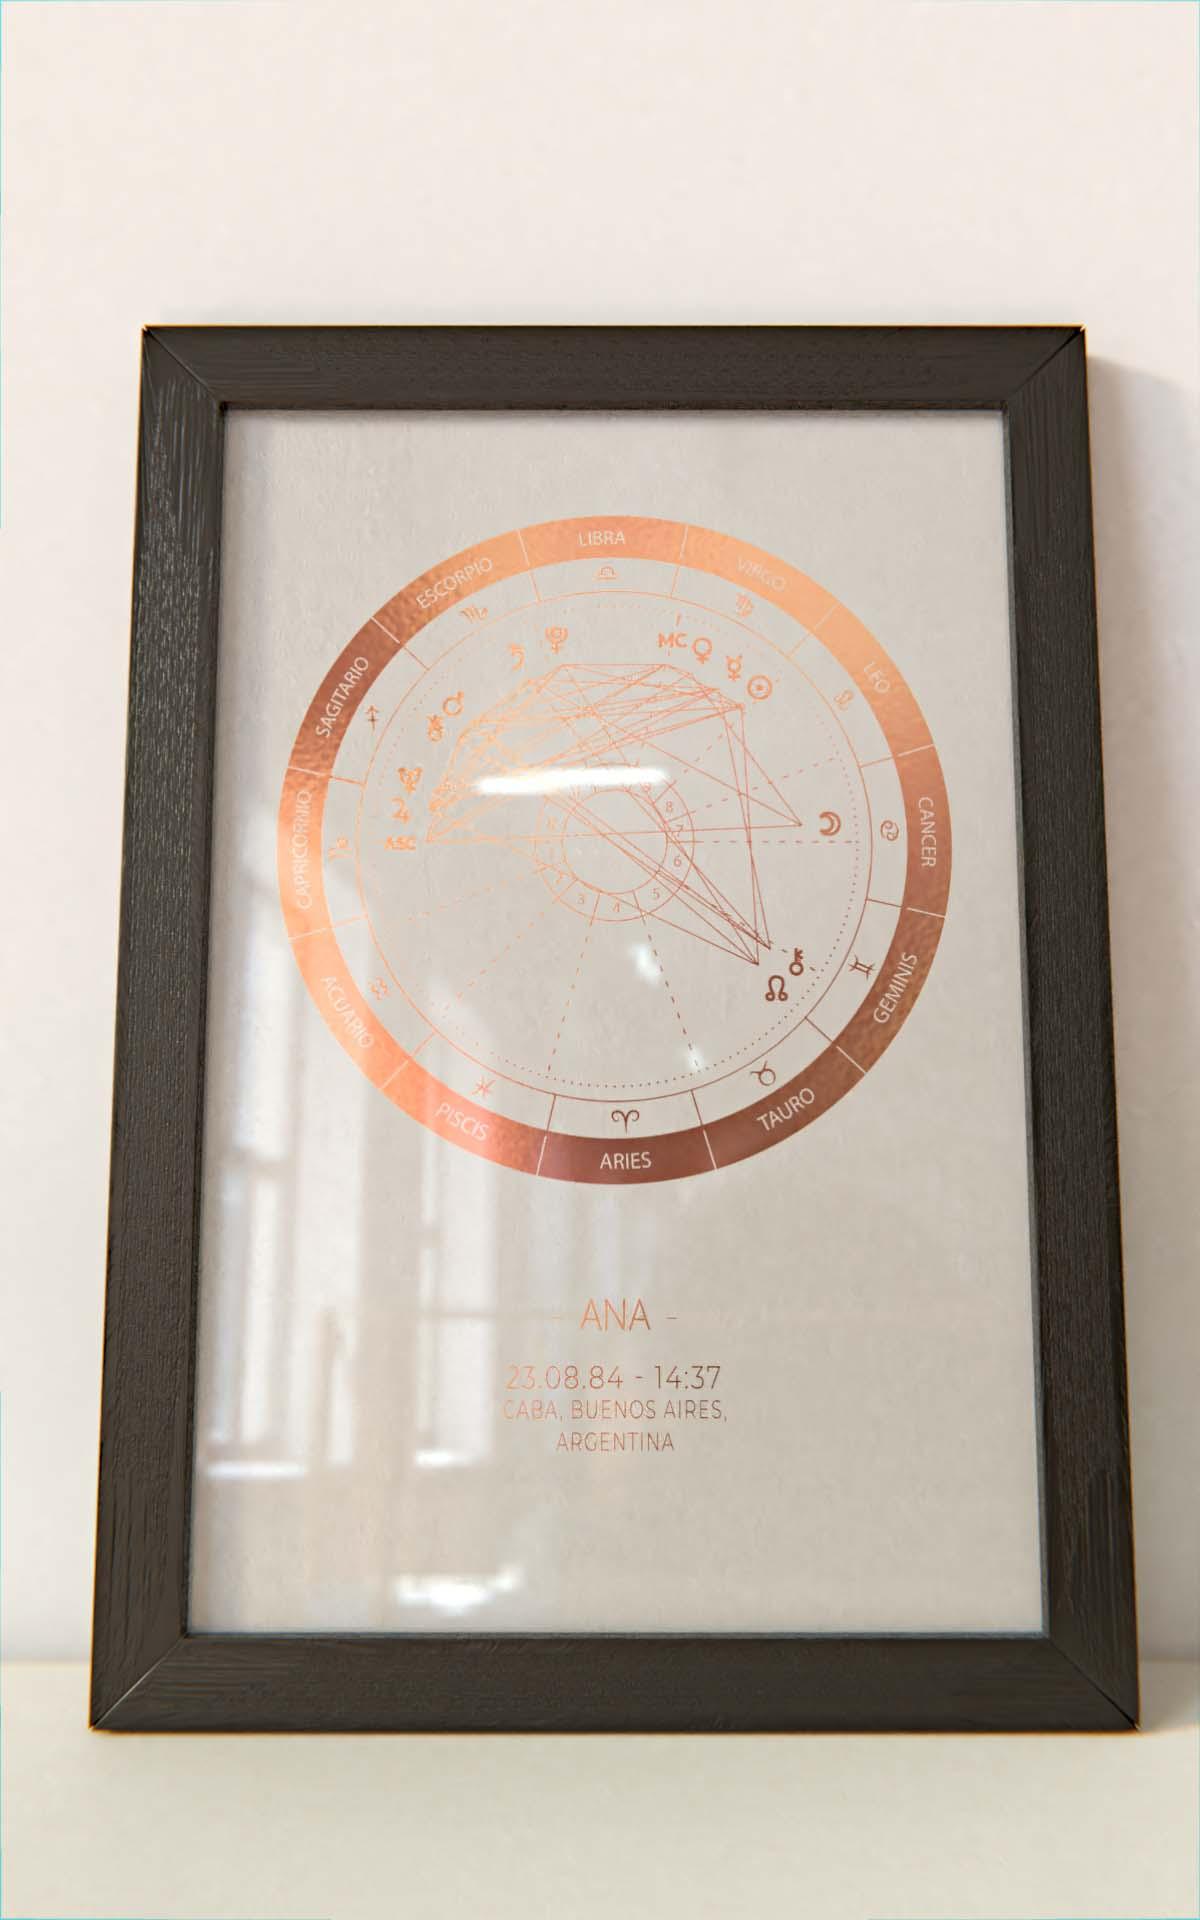 Arte Astral - Carta Astral Simple Cobre marco negro Hoja Blanca